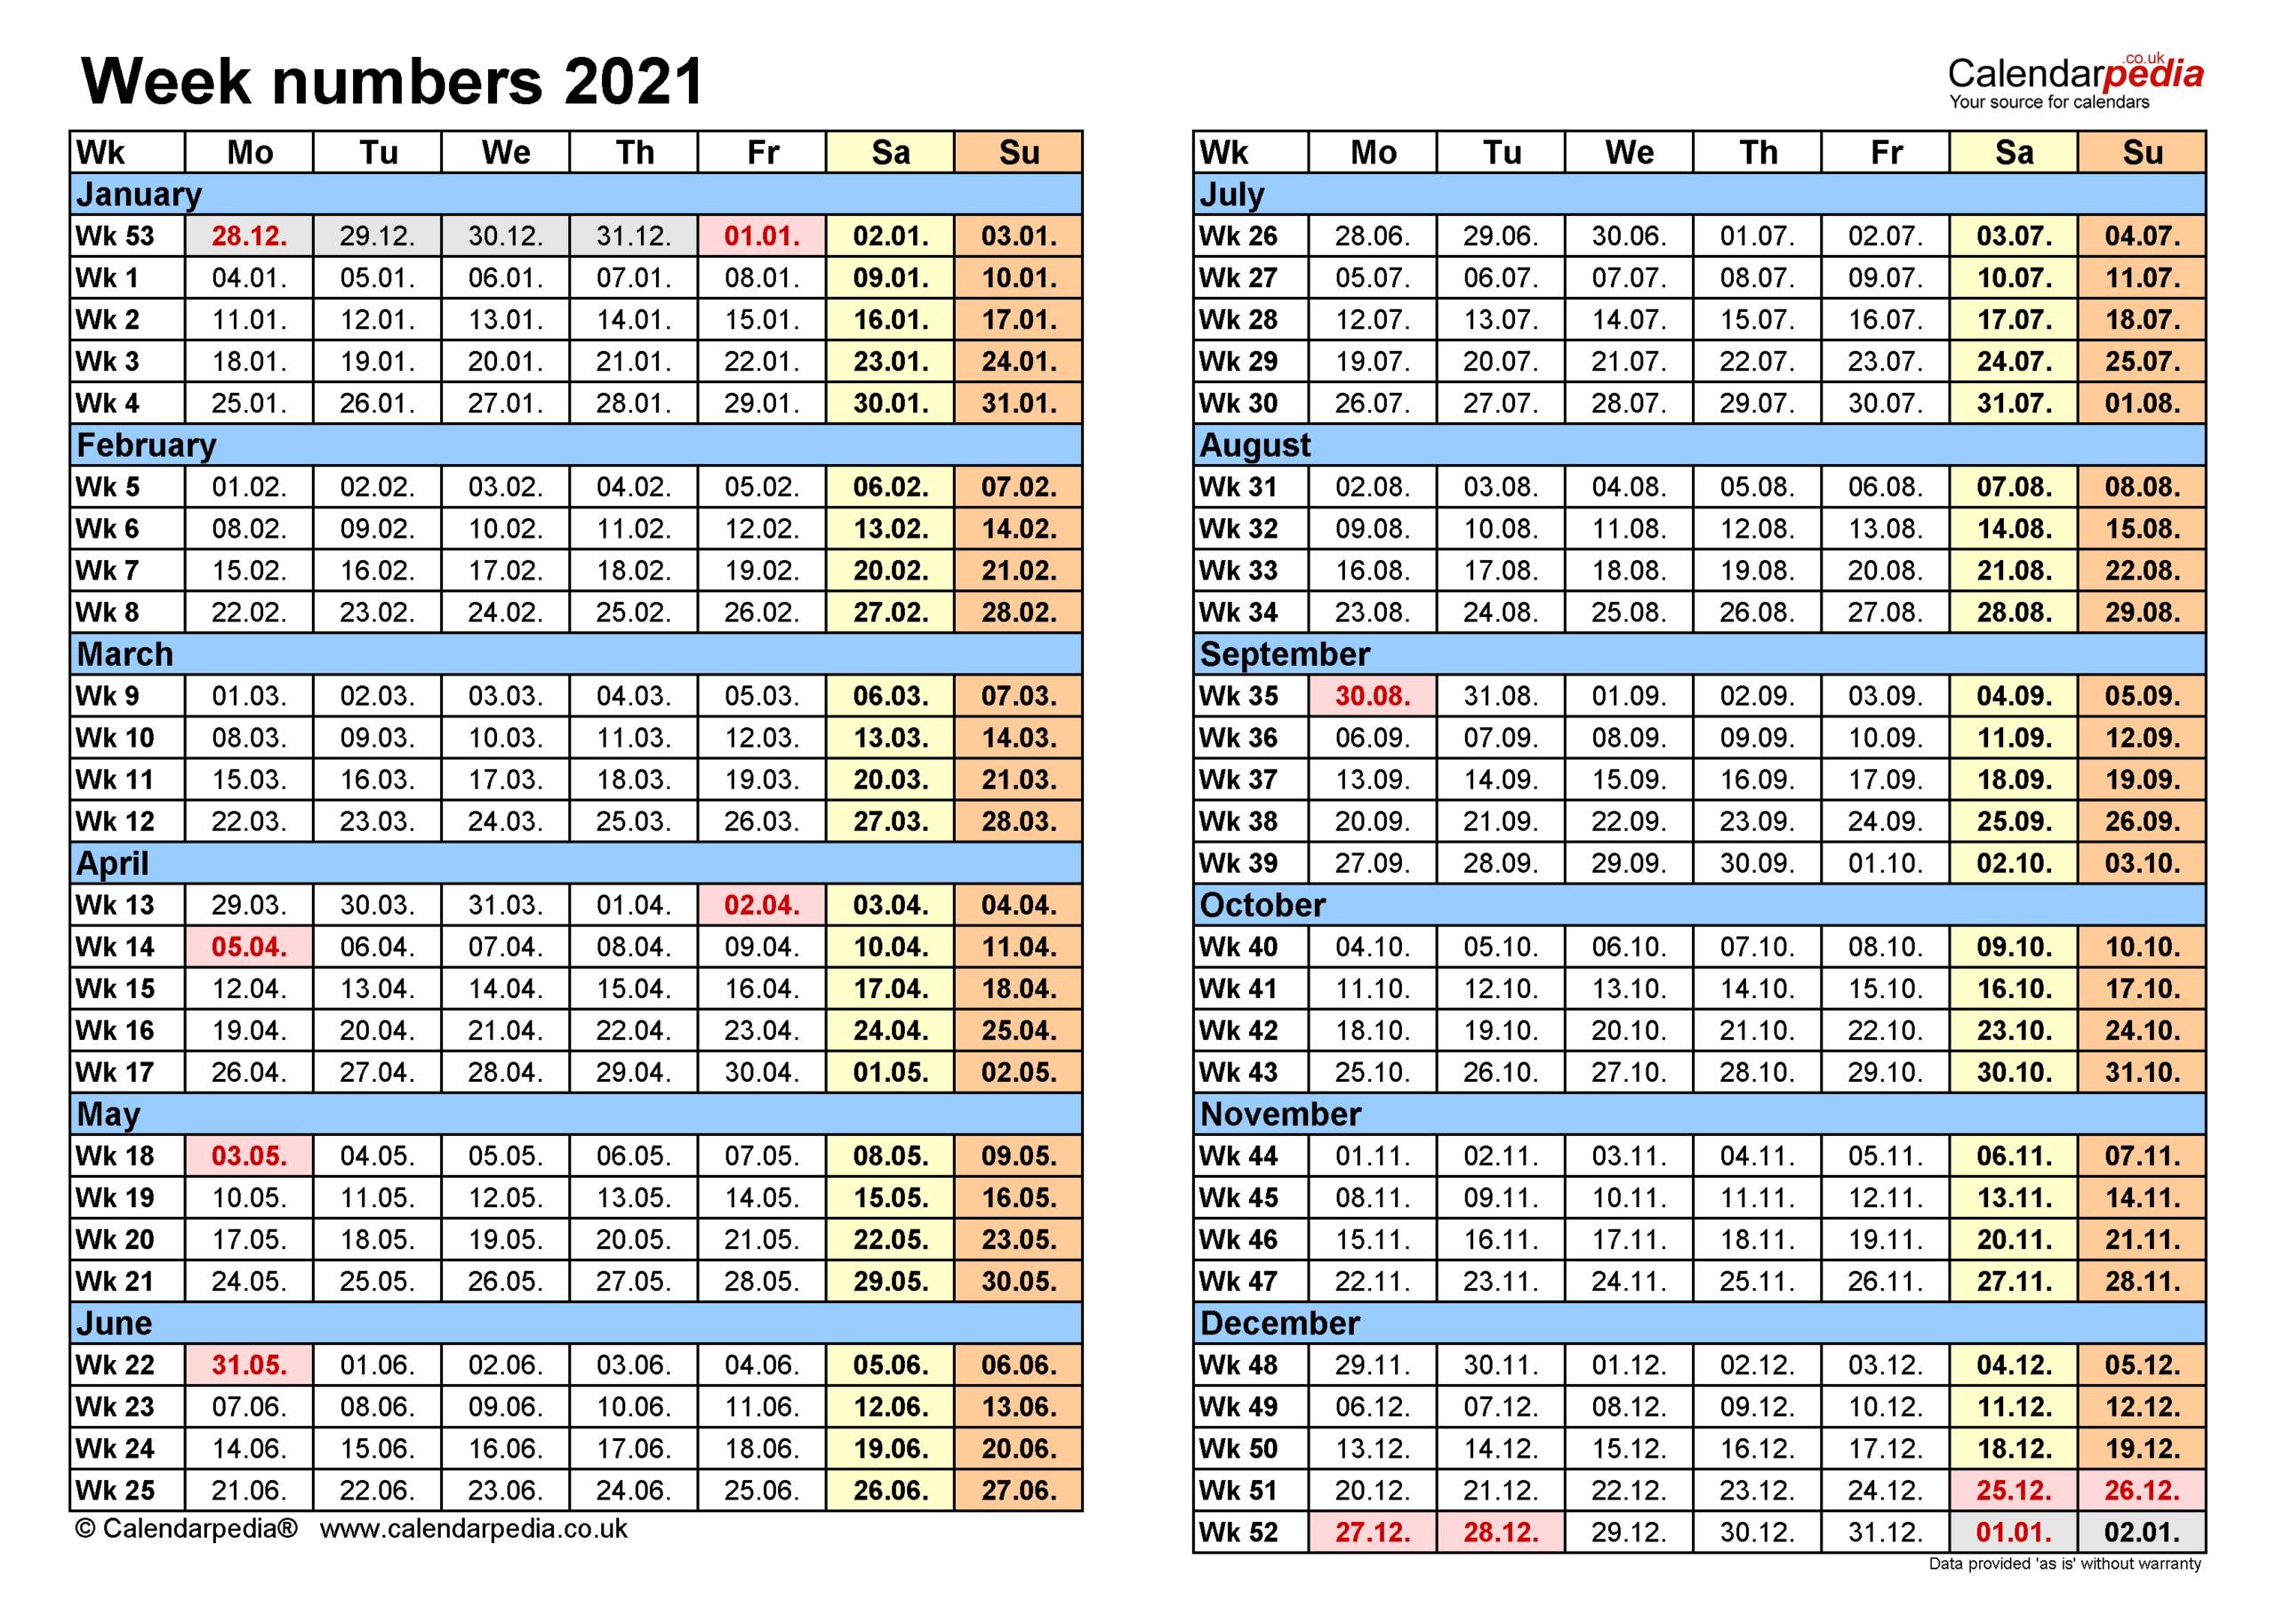 Week Numbers 2021 With Excel, Word And Pdf Templates regarding Monthly Calendar By Week Number 2021